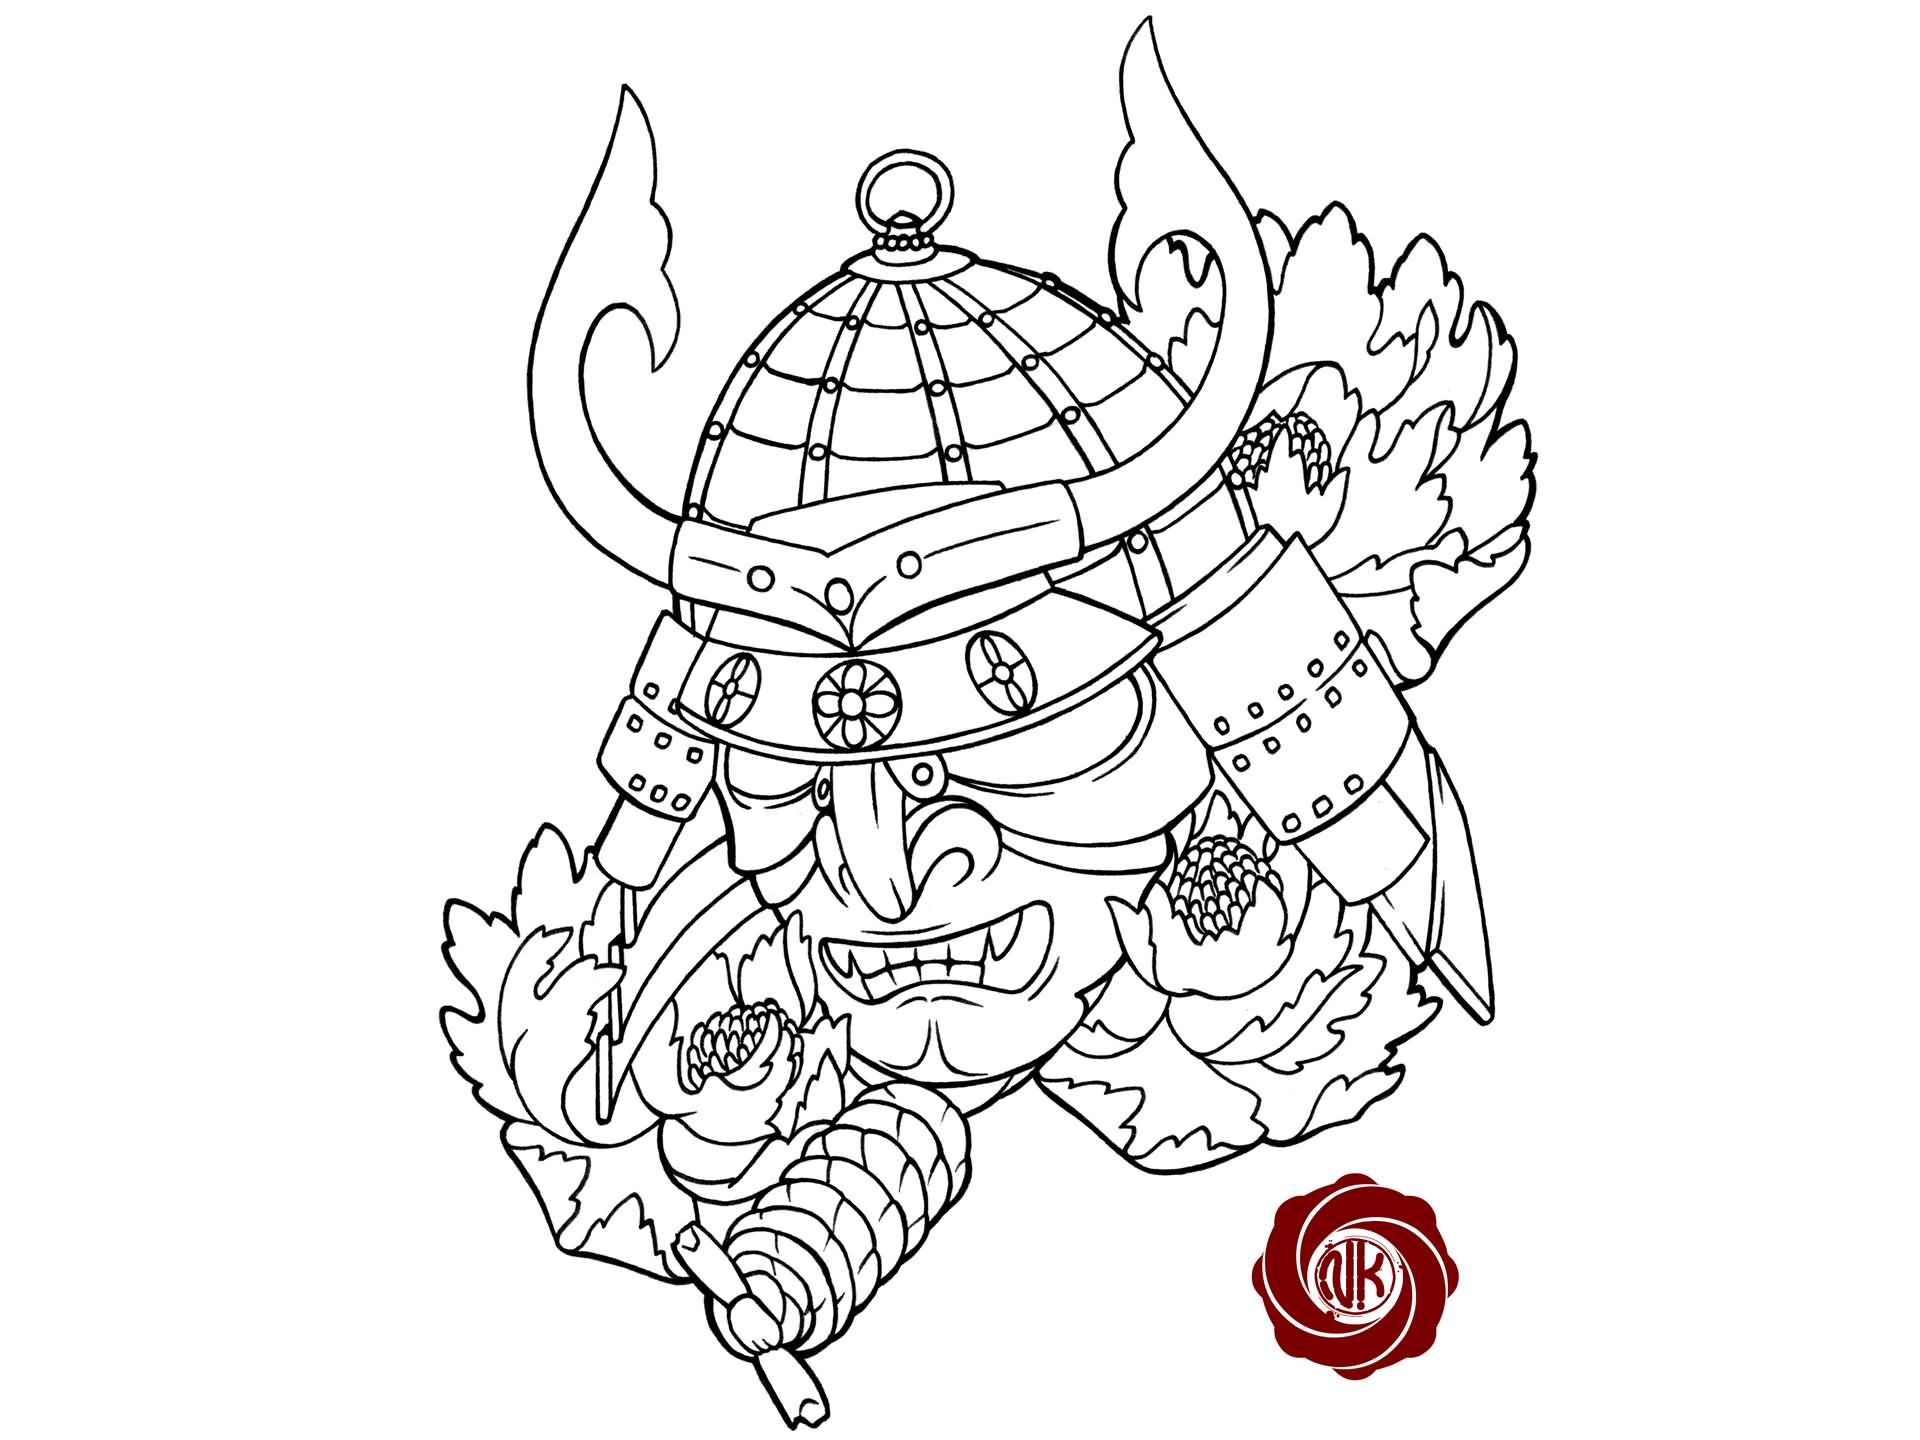 Black Outline Samurai Head With Flowers Tattoo Stencil